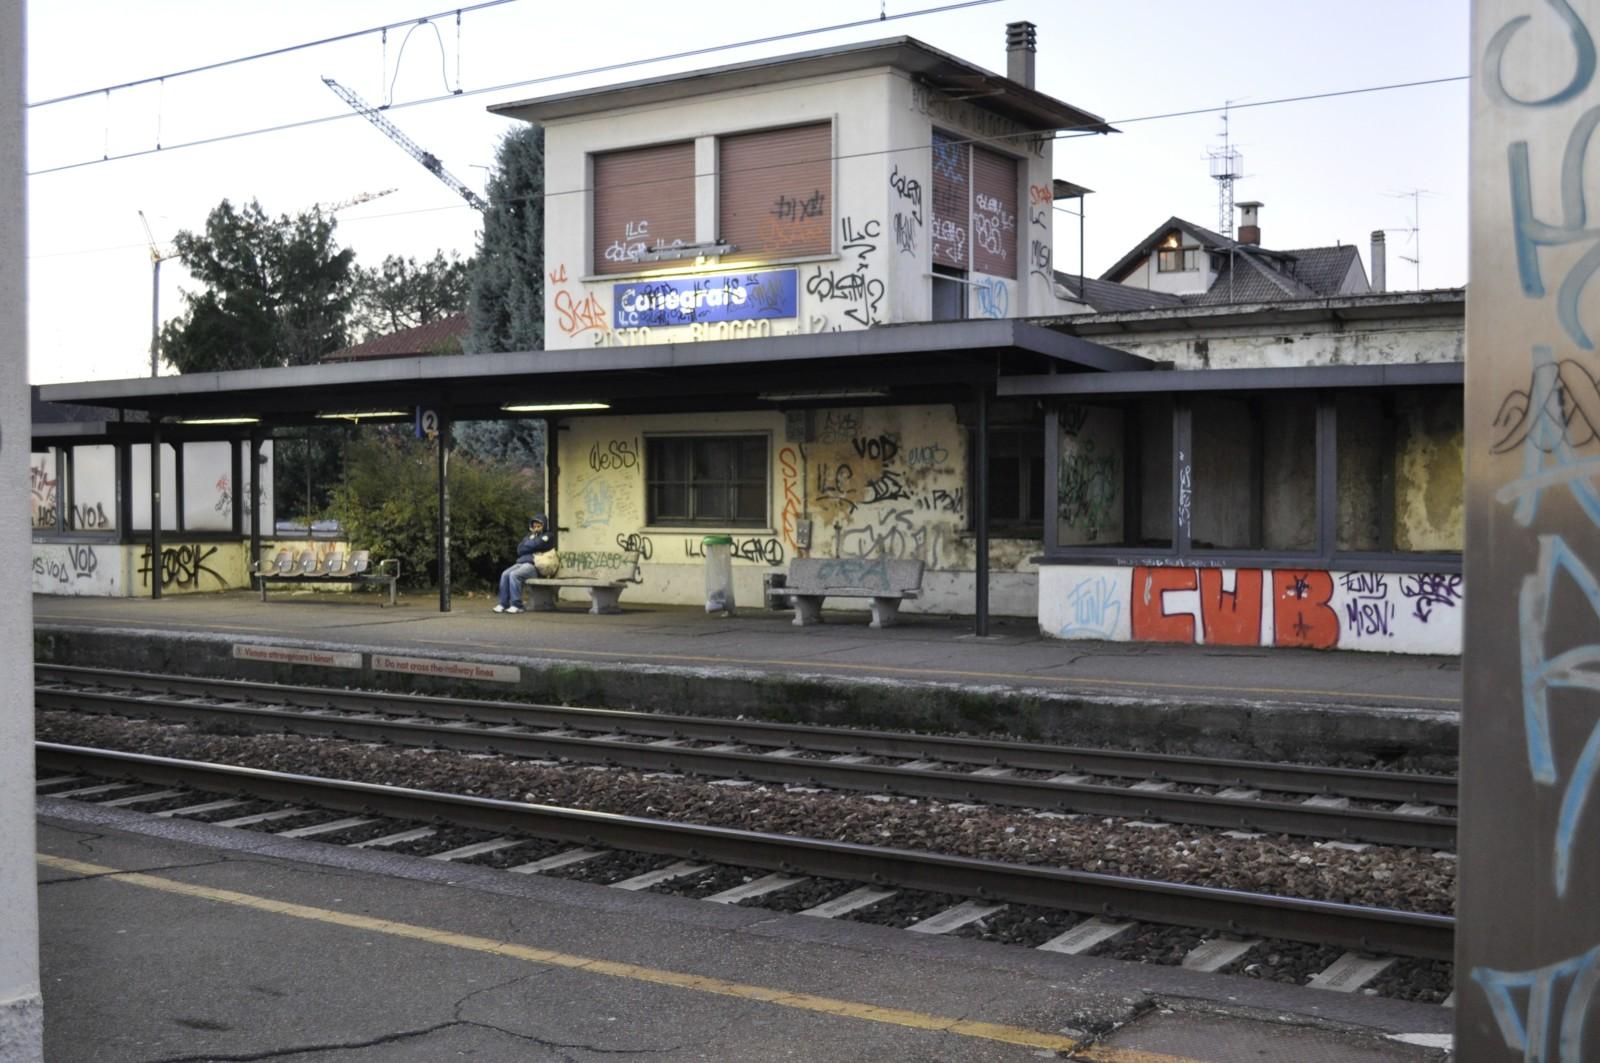 Canegrate stazione